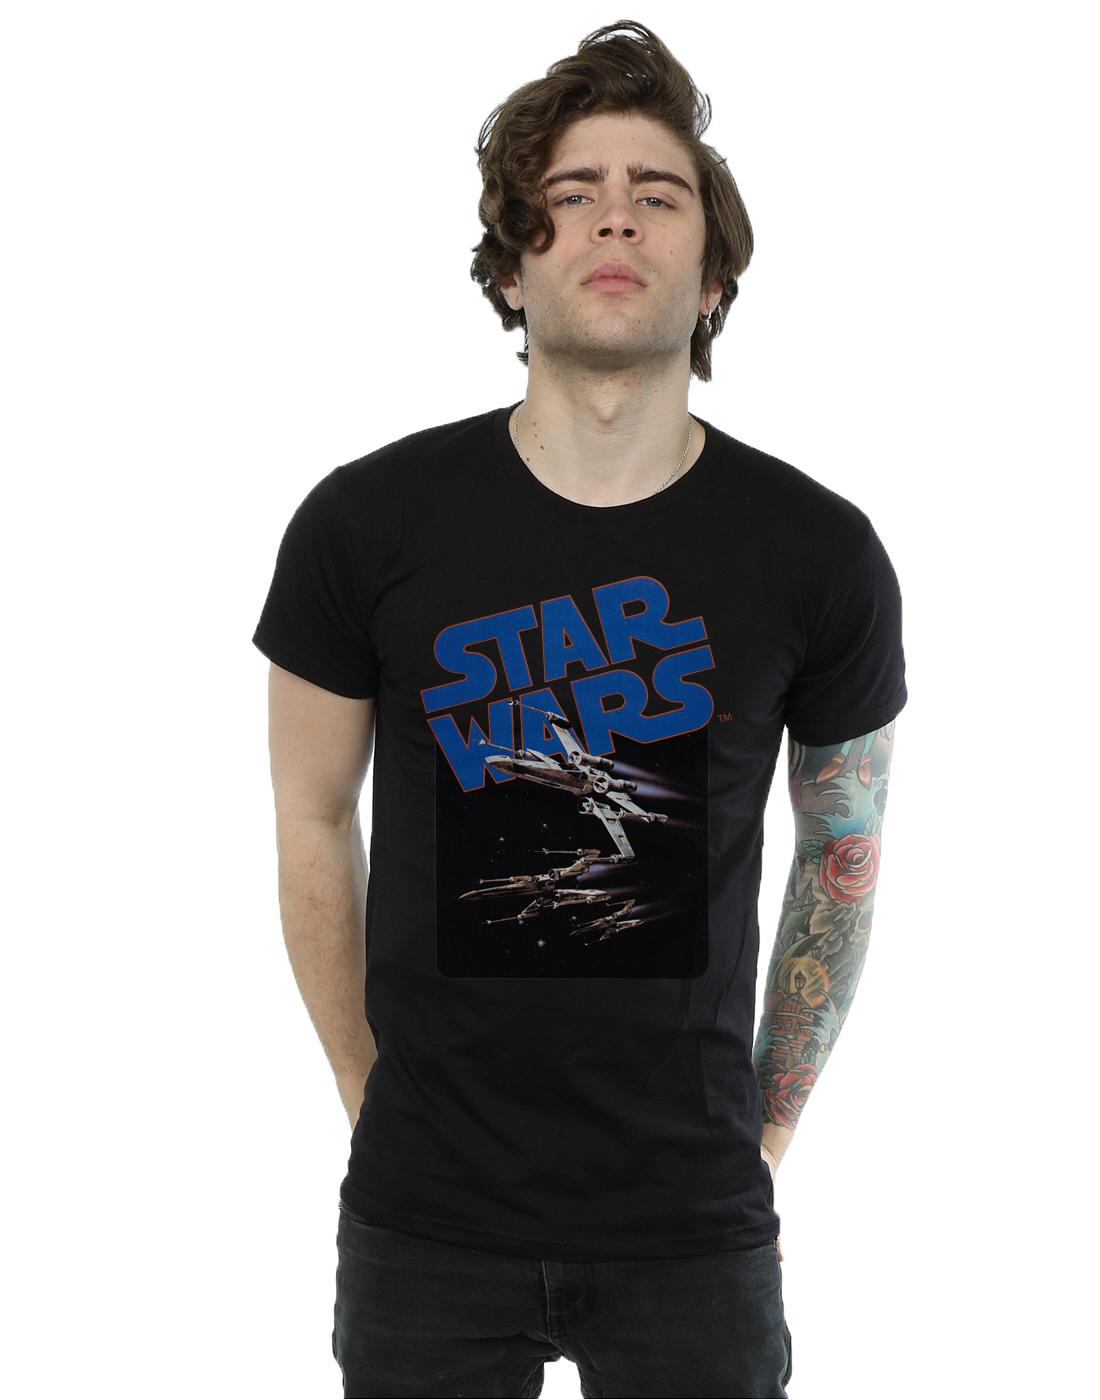 Star-Wars-T-Shirt-Mens-Official-Merchandise thumbnail 38